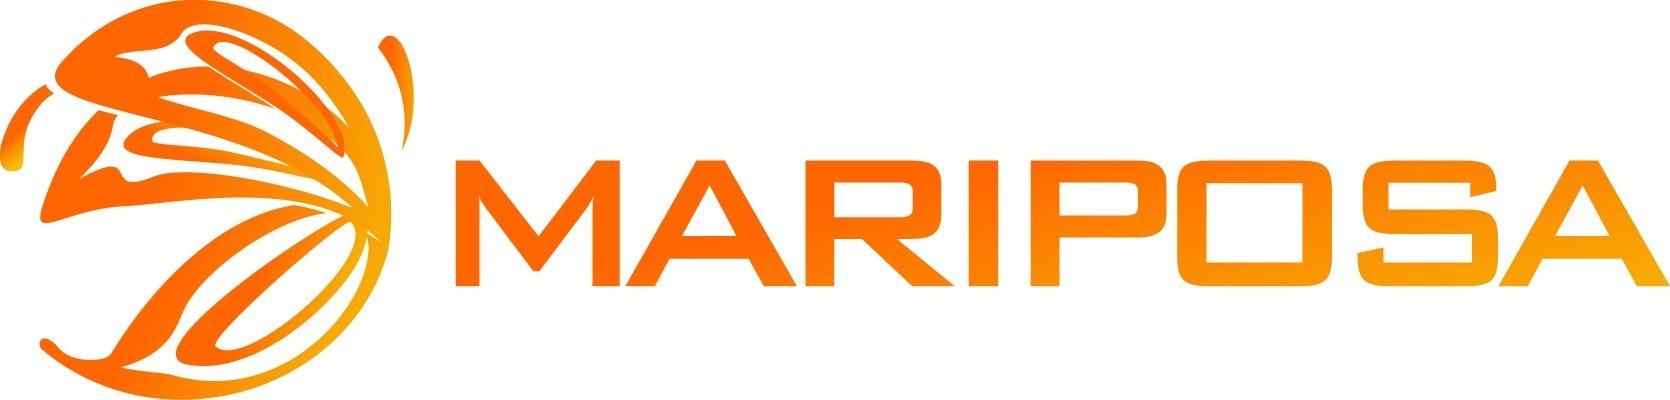 Prepaid Reviews BlogMariposa Rumored to Launch MVNO ... | 1670 x 400 jpeg 69kB